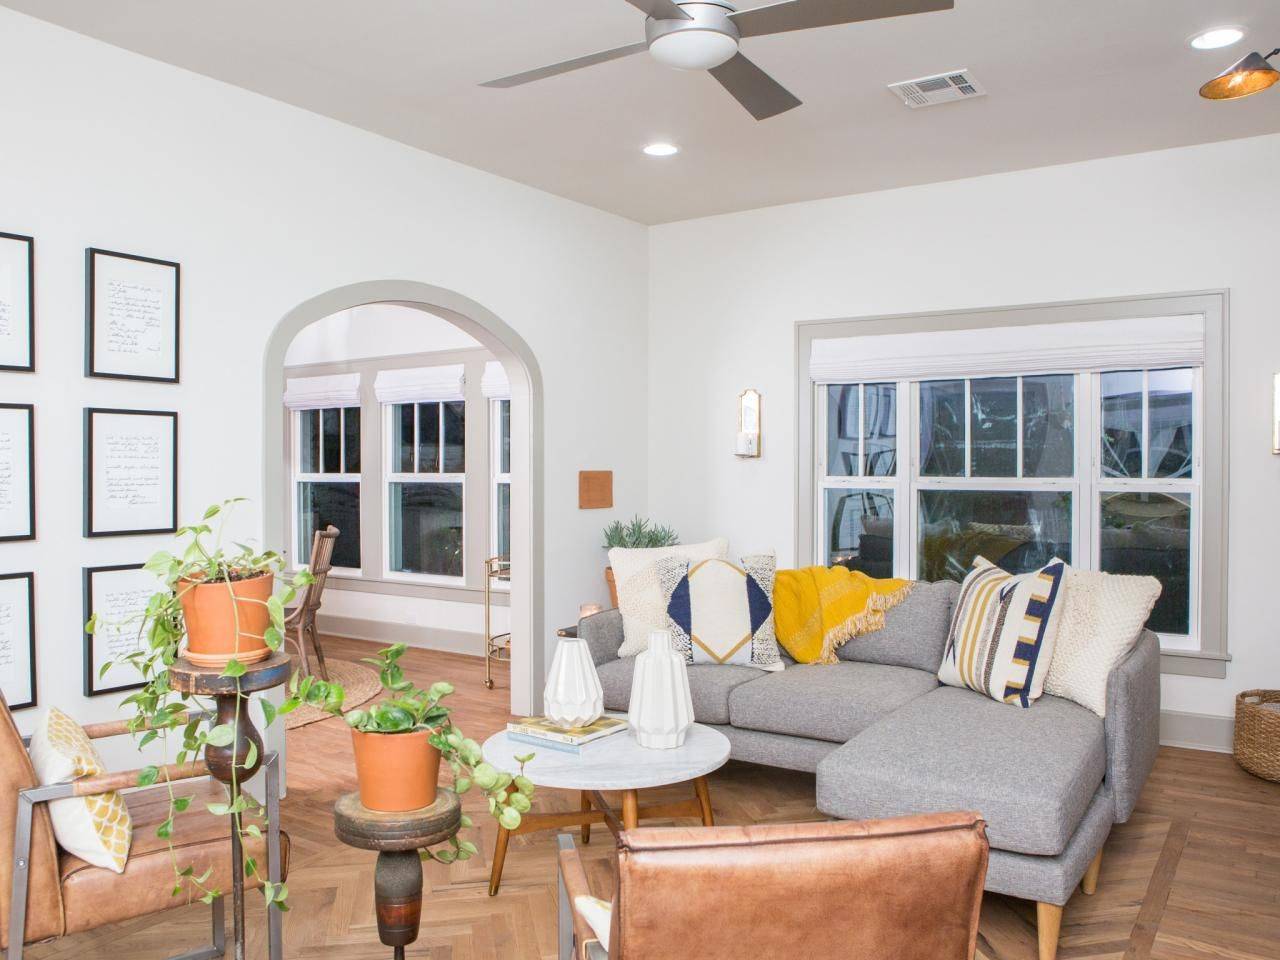 Joanna Gaines Living Room Fixer Upper Living Room Joanna Gaines Living Room Hgtv Living Room Design